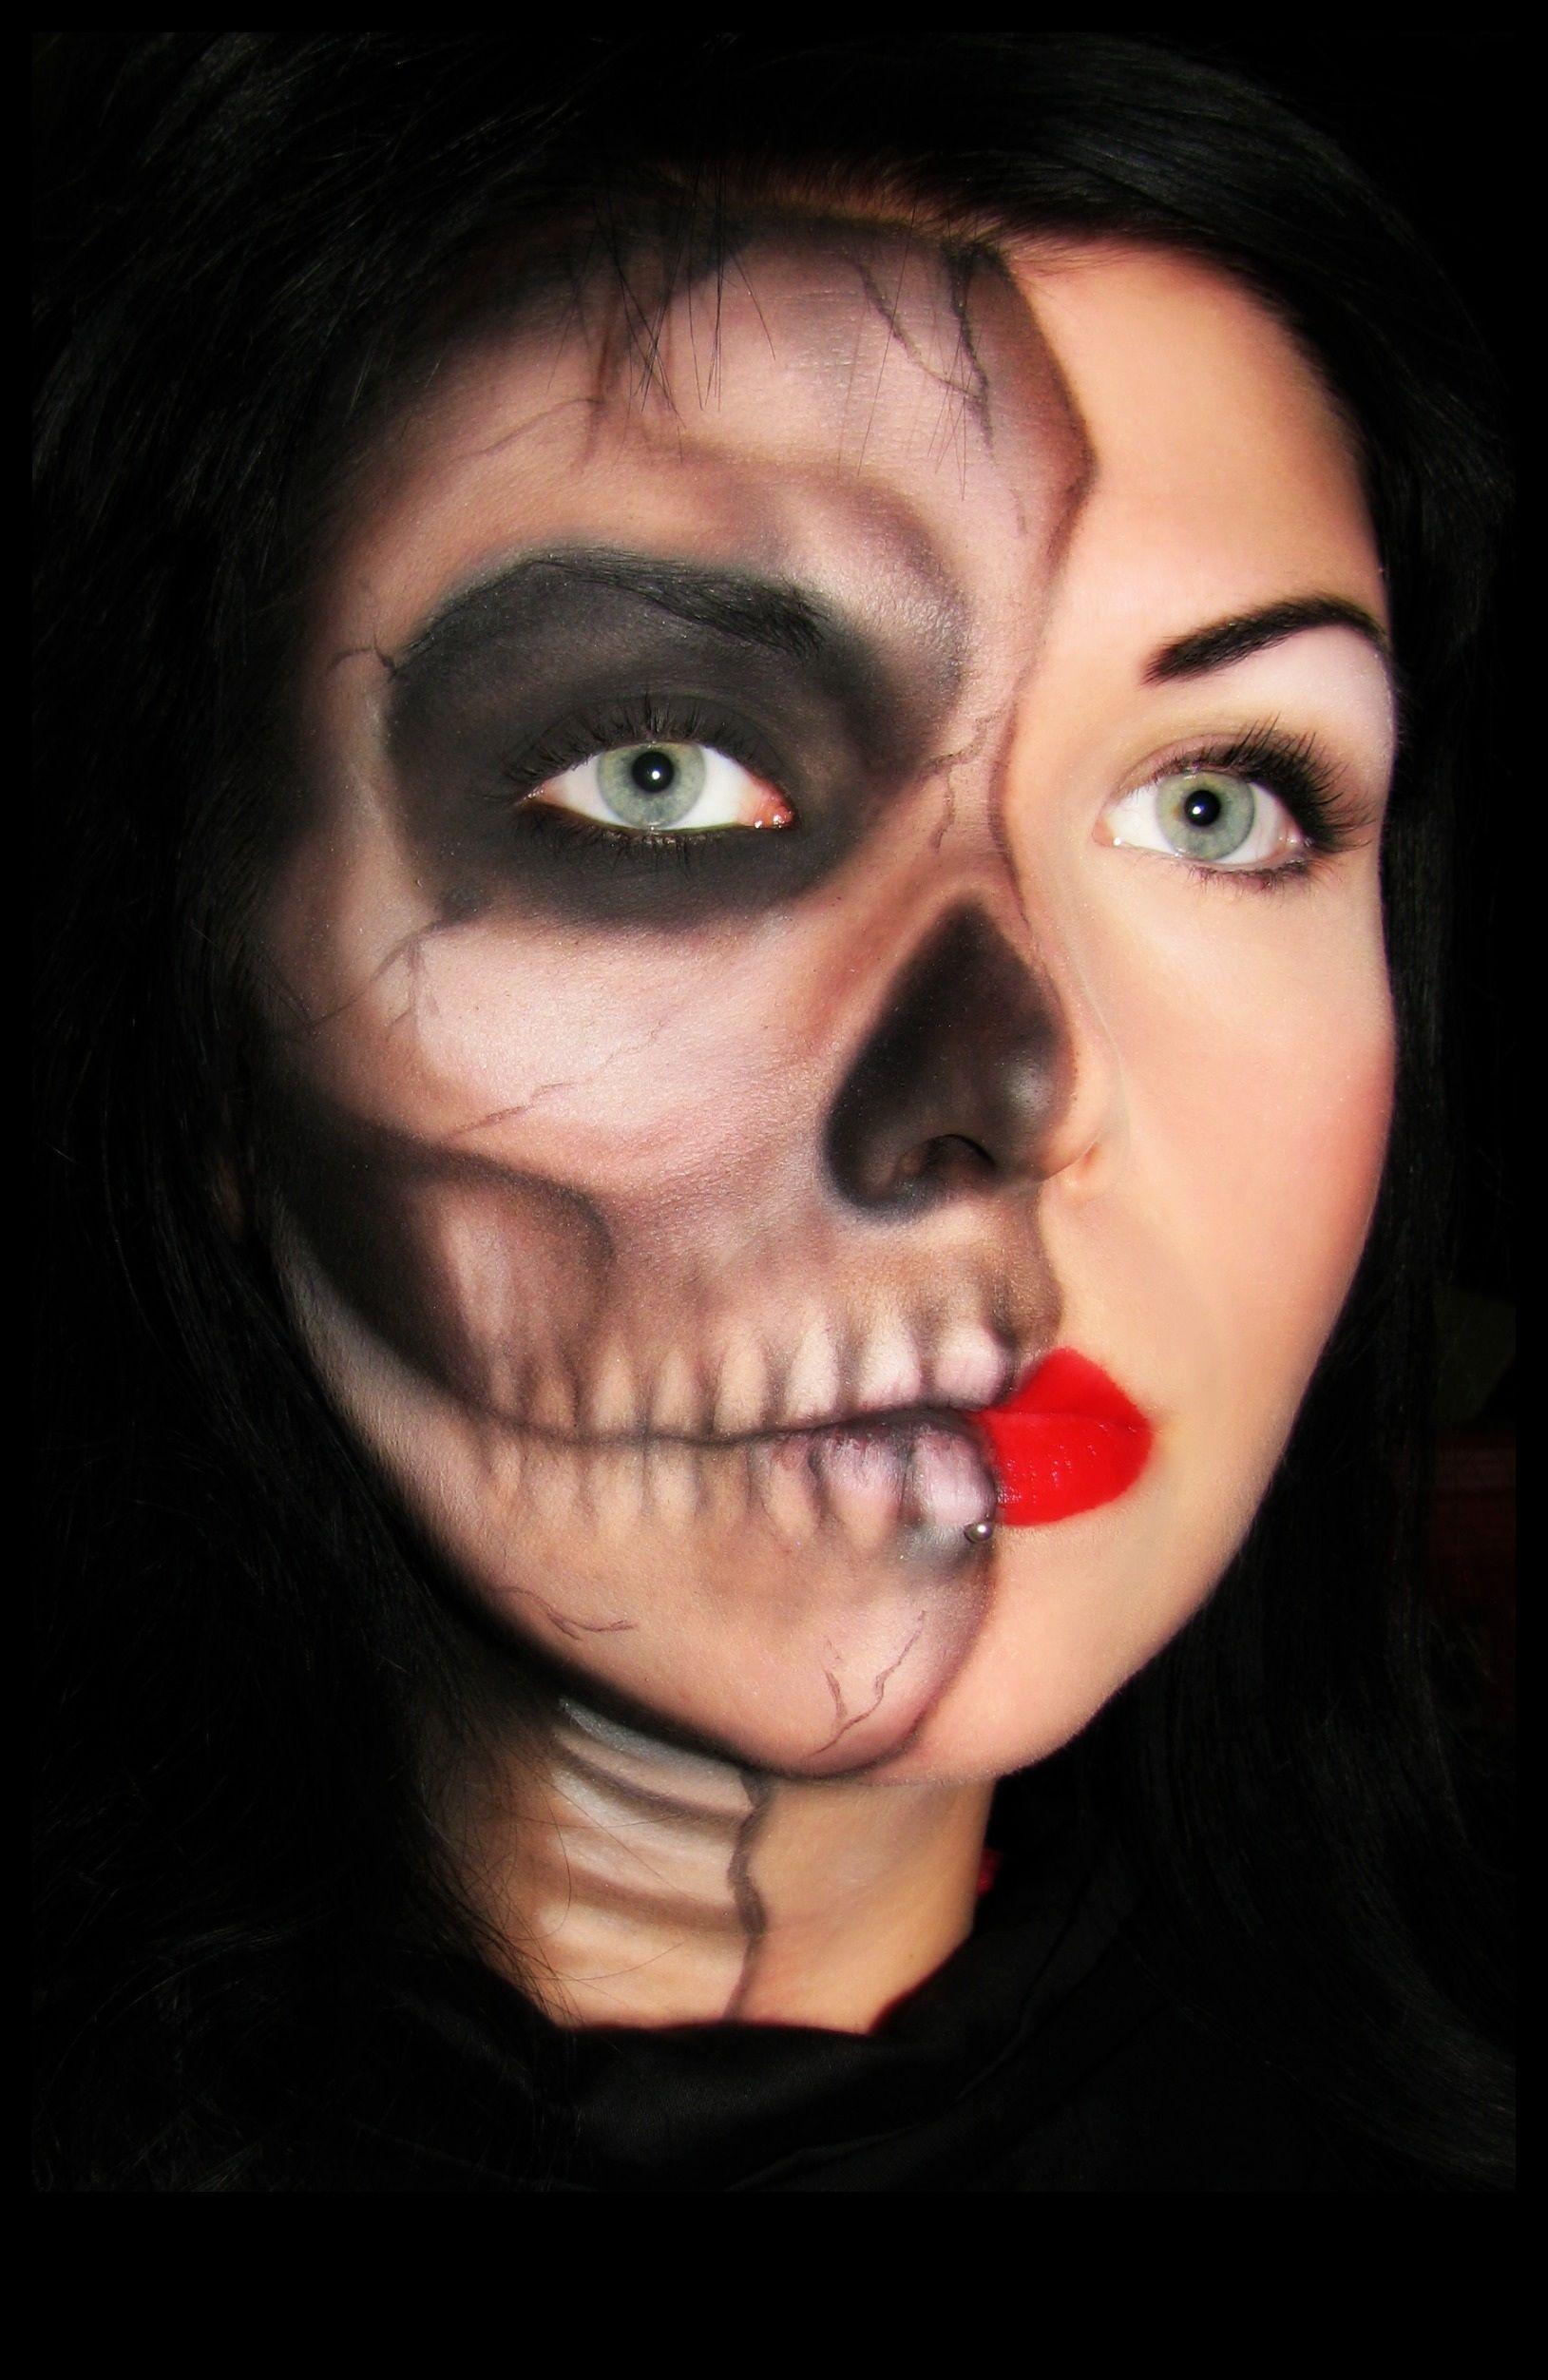 Half beauty makeup, half skull makeup. Skull done entirely